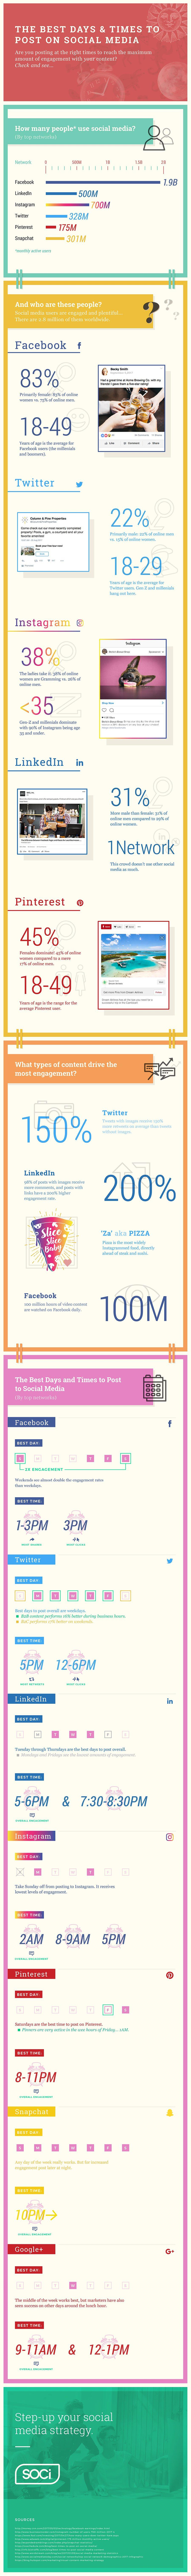 Social Media Secrets: When to Post on Social Media [Infographic]